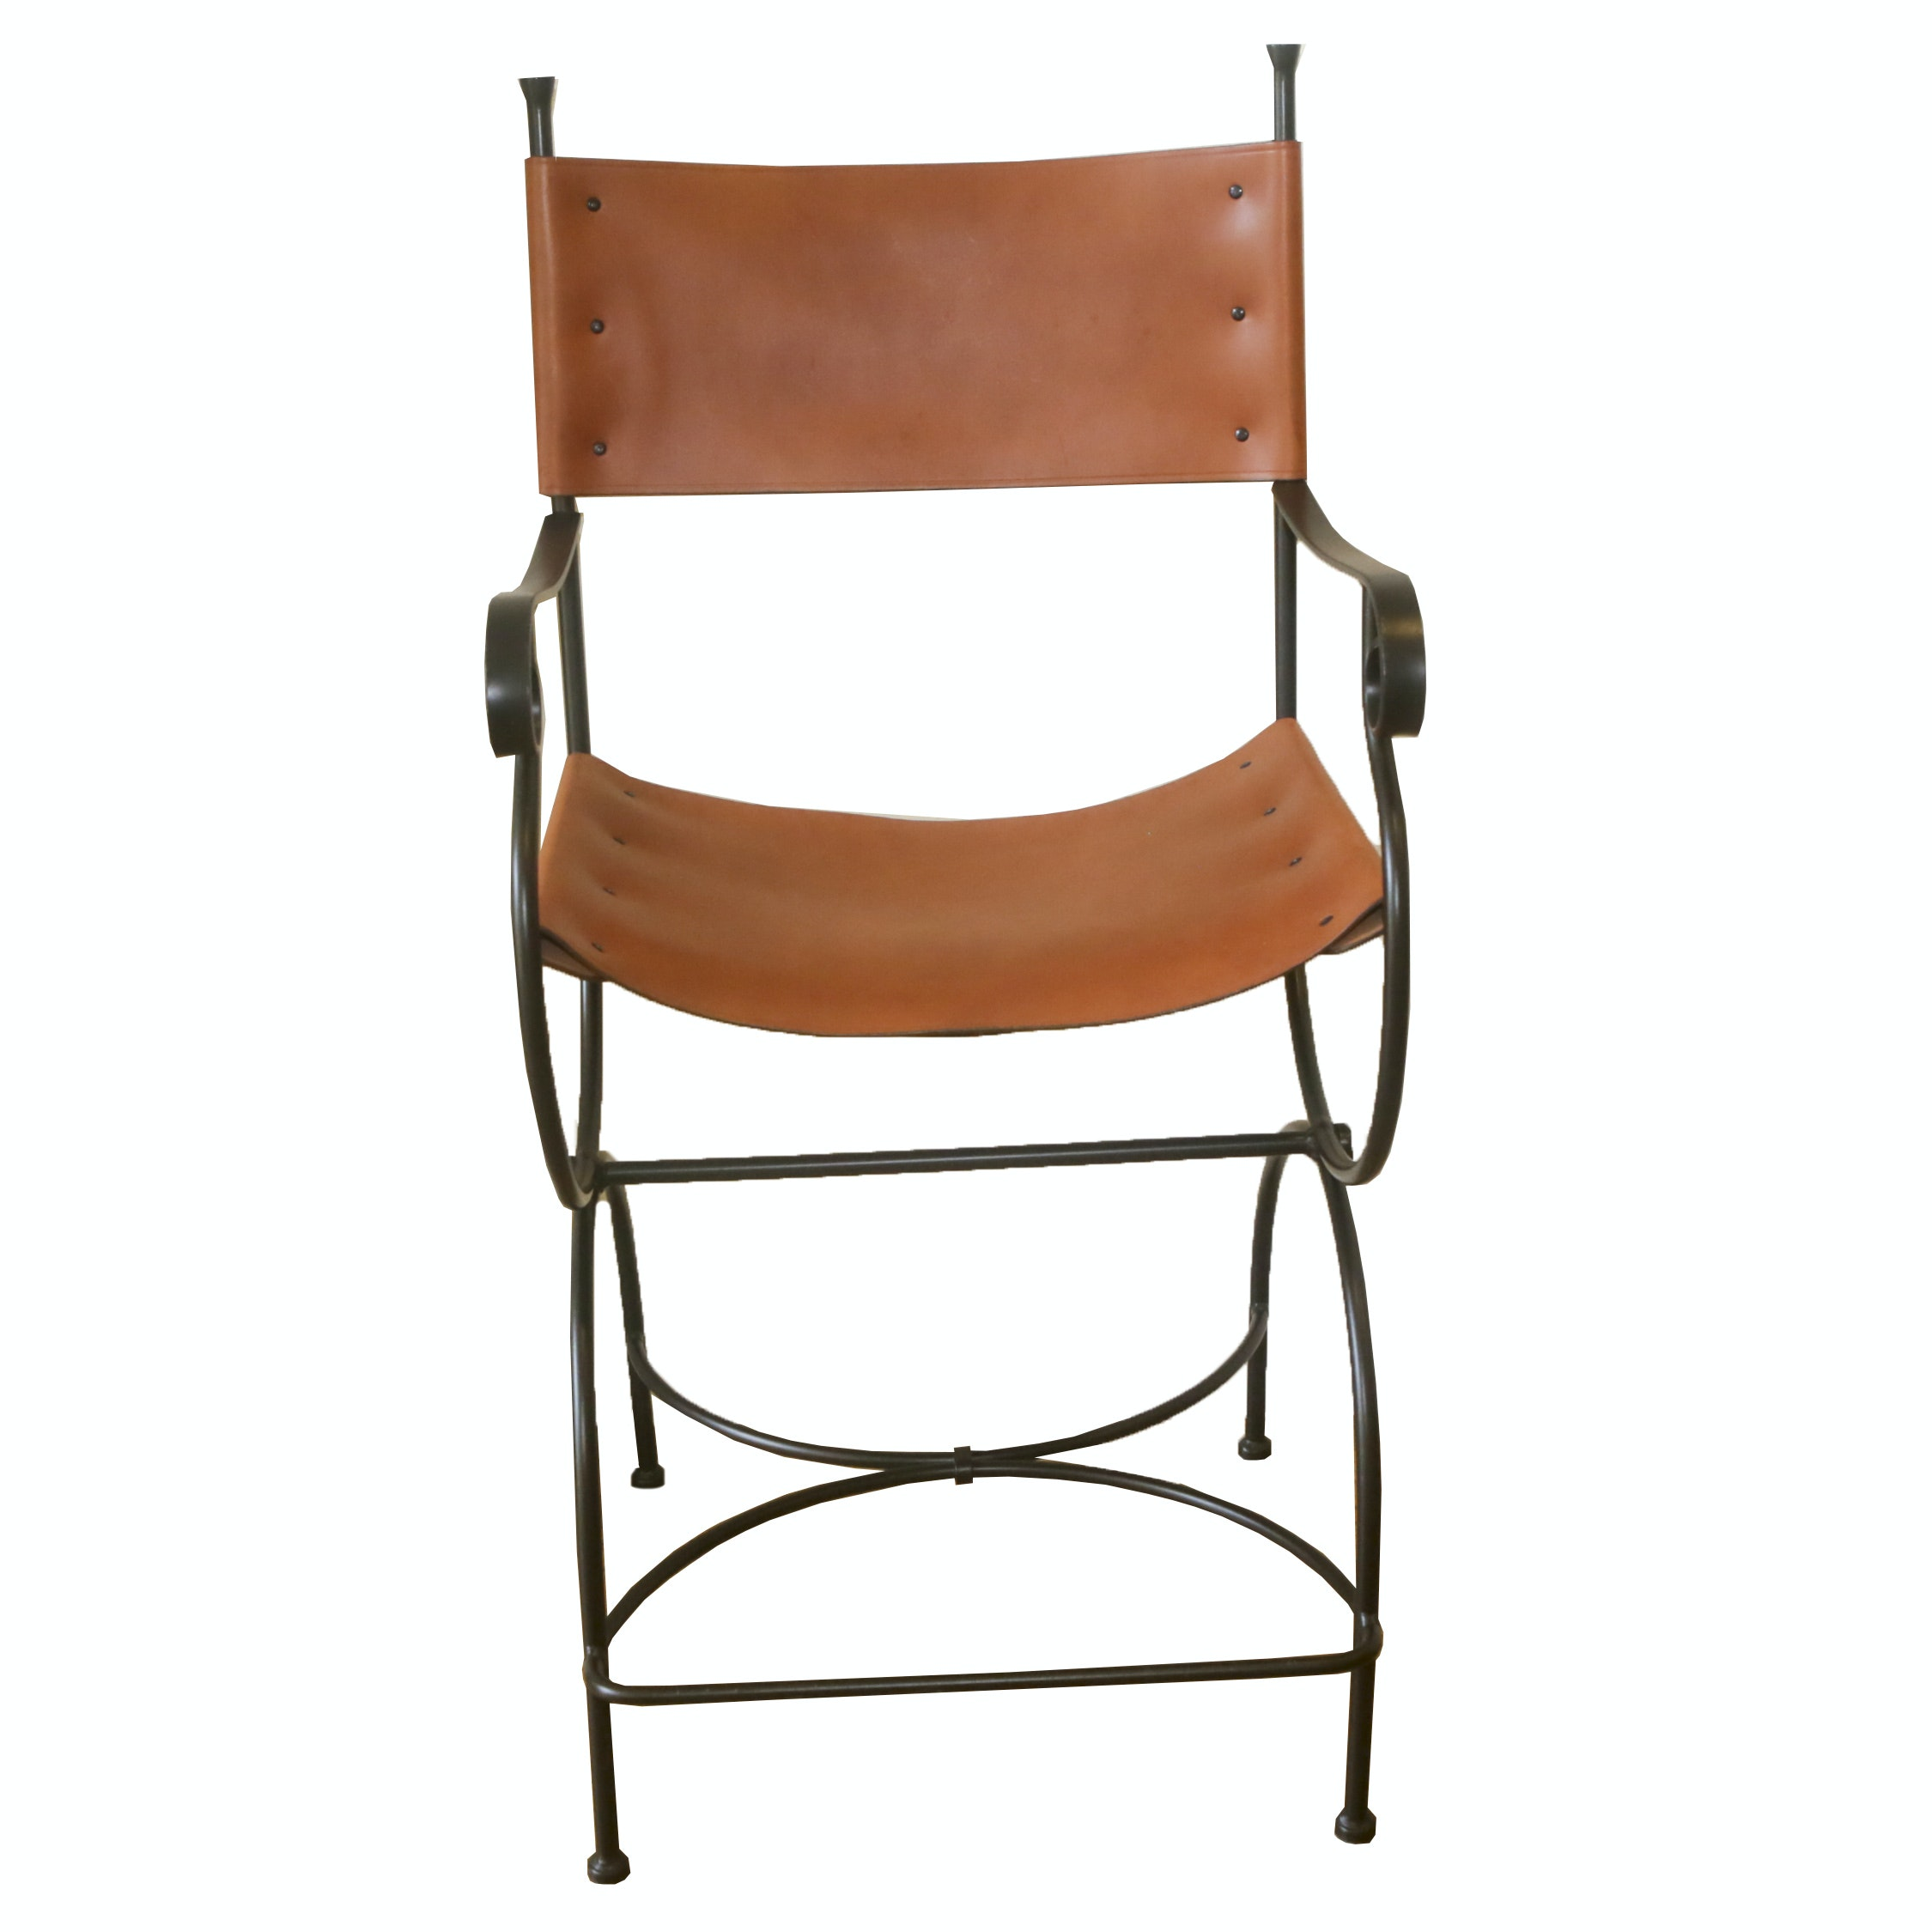 Charmant Leather Directoru0027s Chair Barstool ...